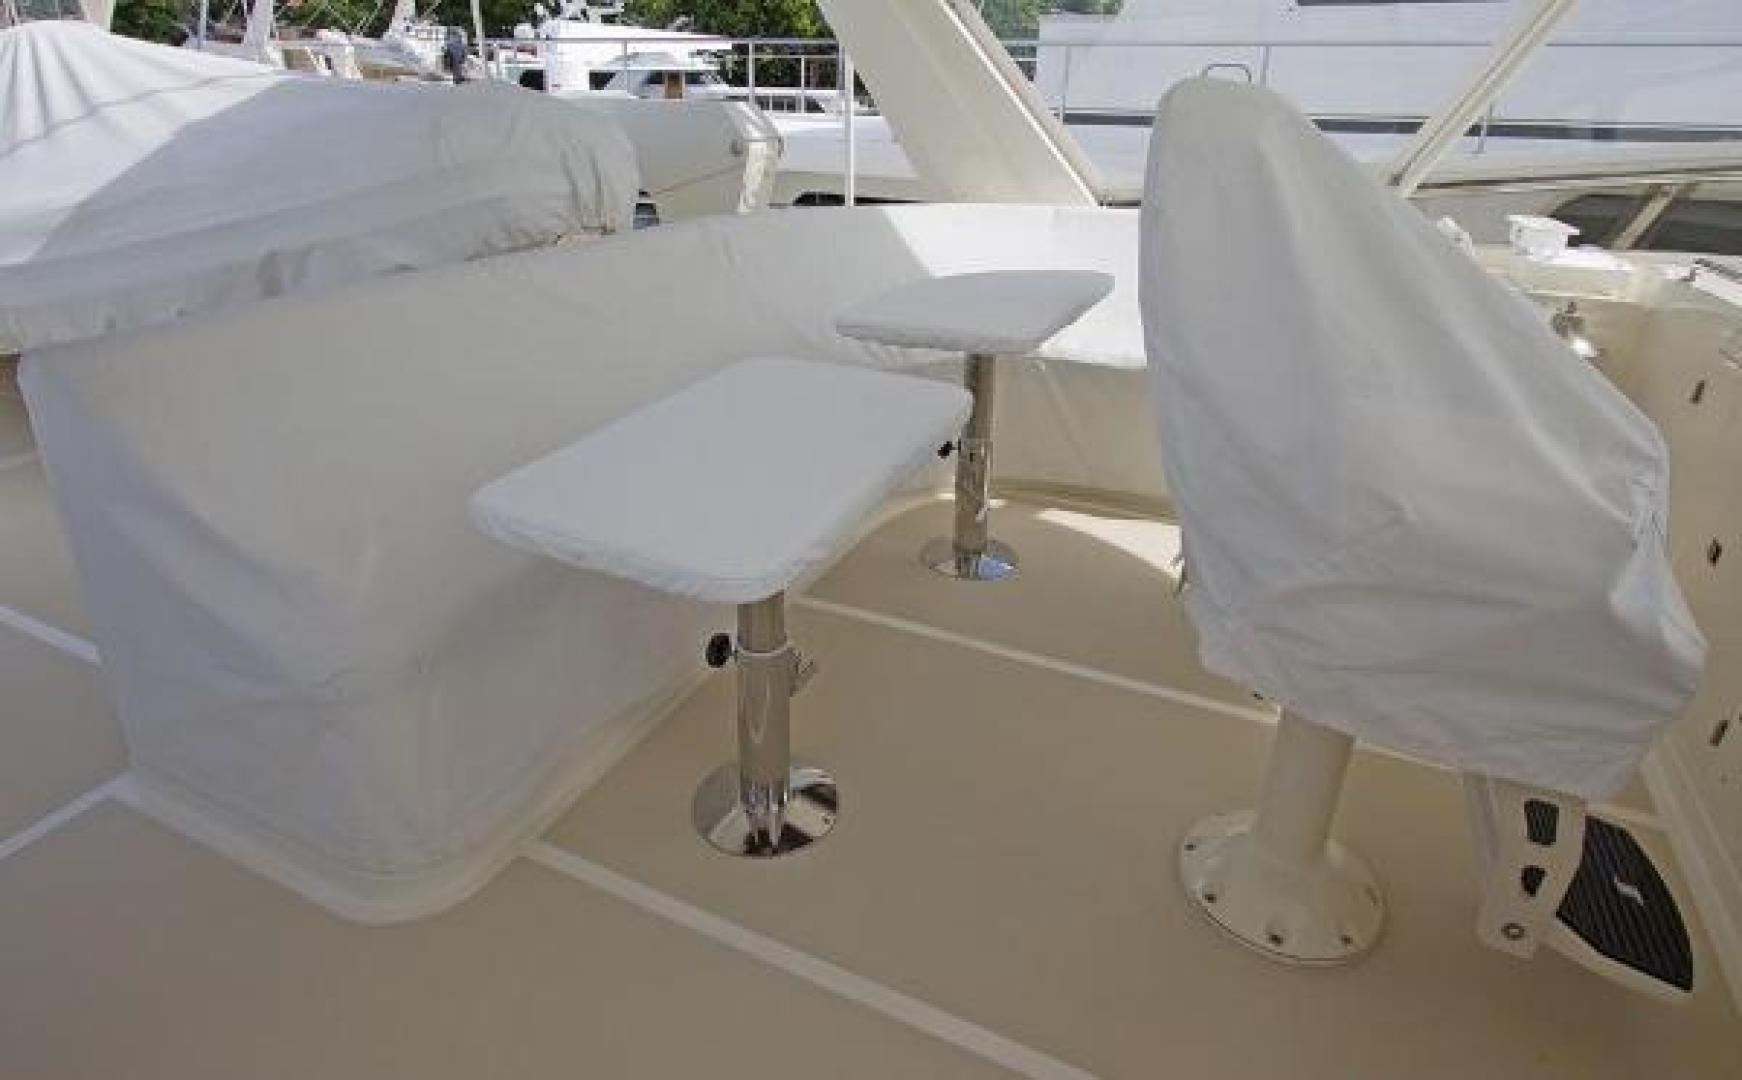 Offshore Yachts-62 Pilot House 2001-Sandman II Fort Lauderdale-Florida-United States-1367894   Thumbnail